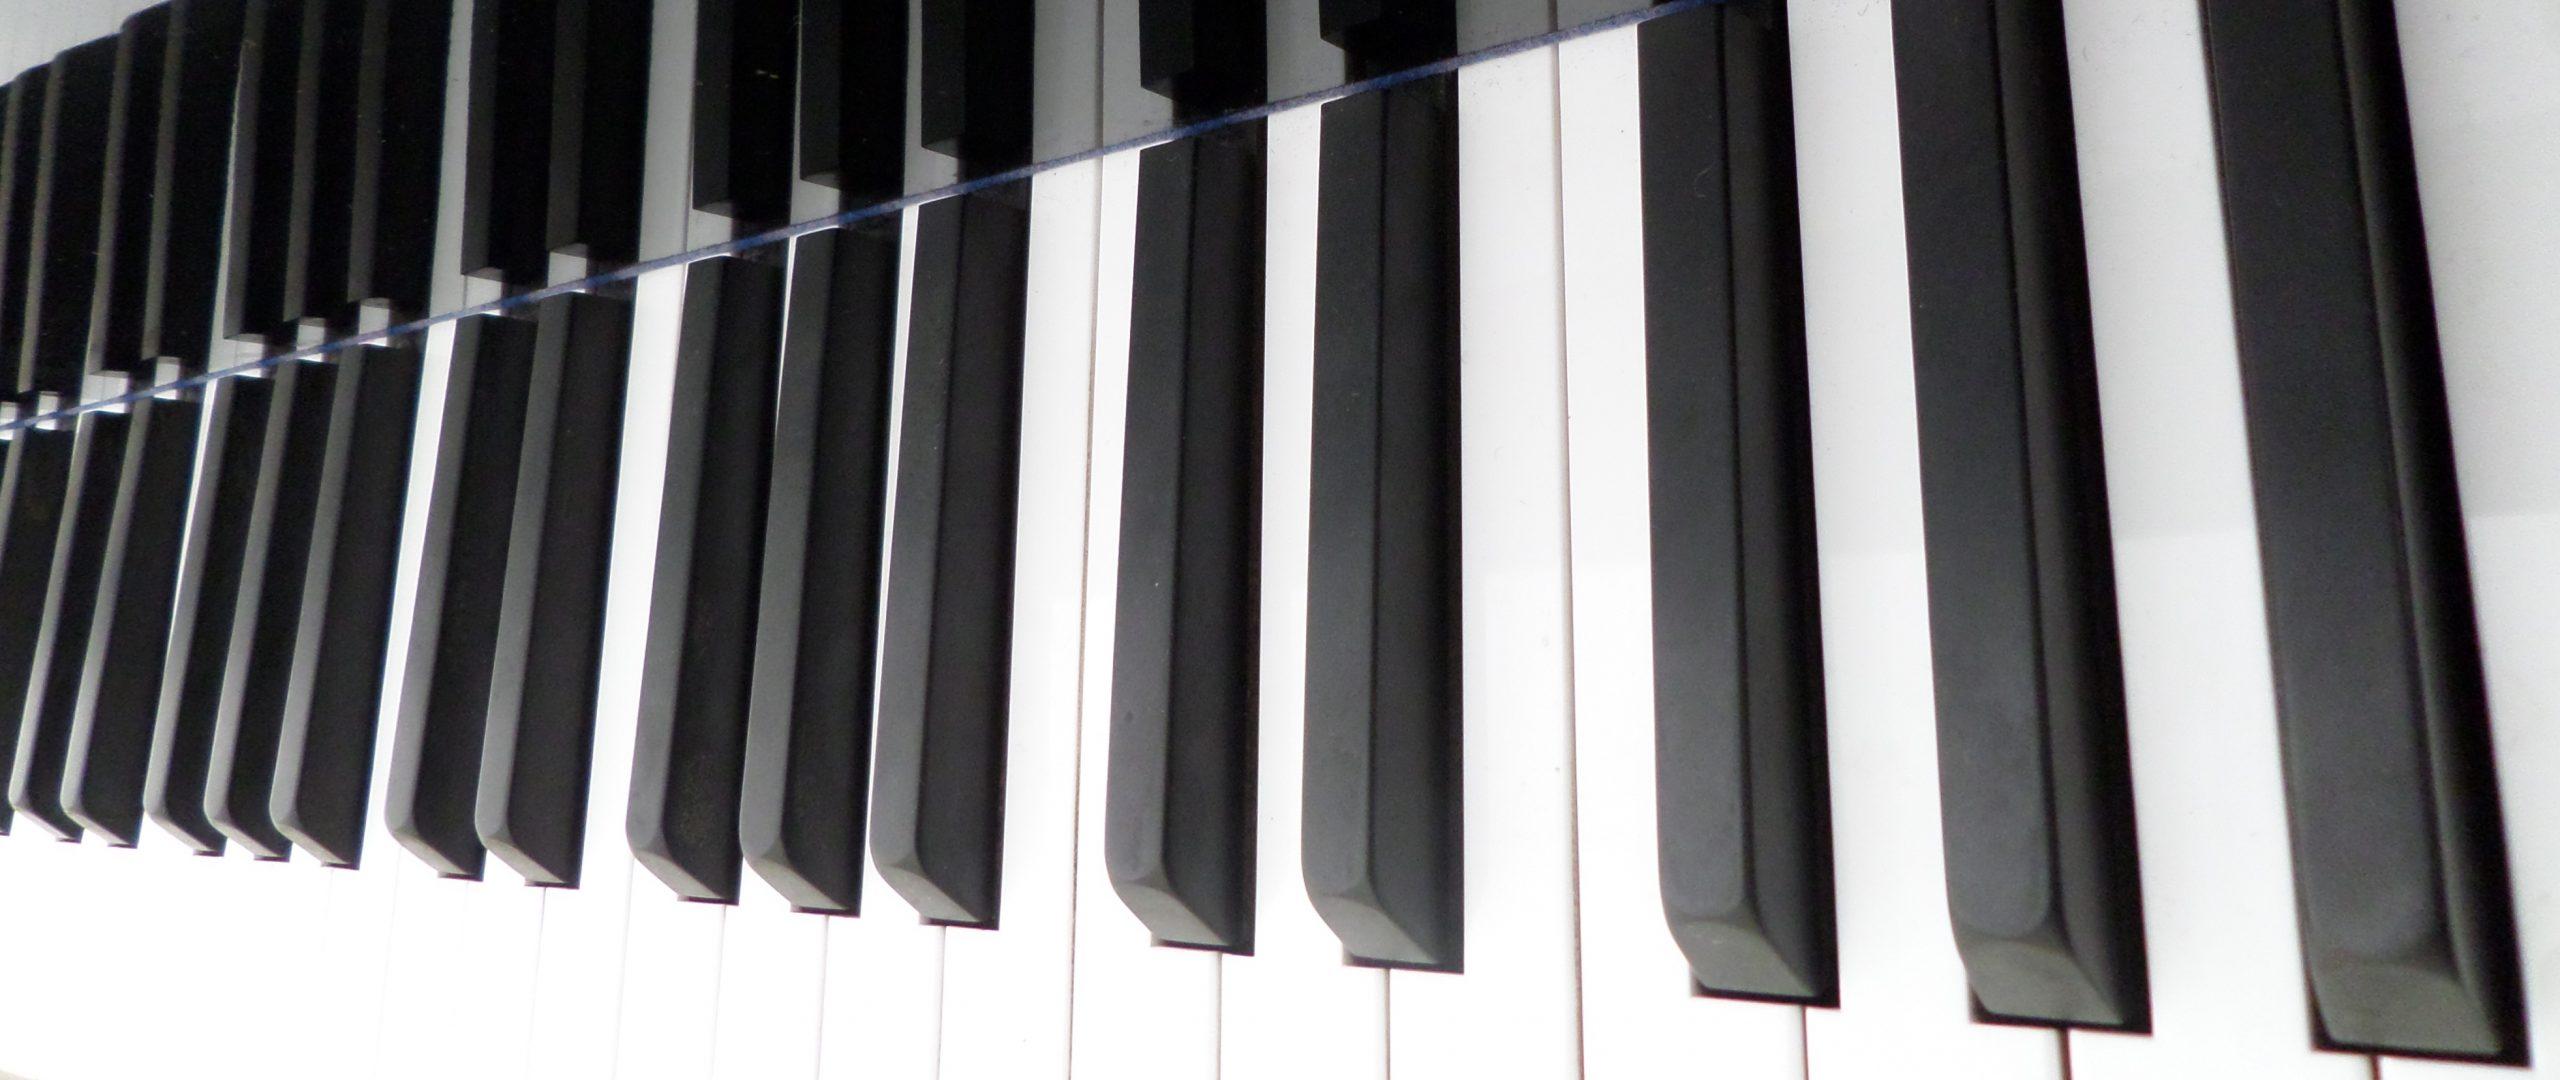 UK Pianist